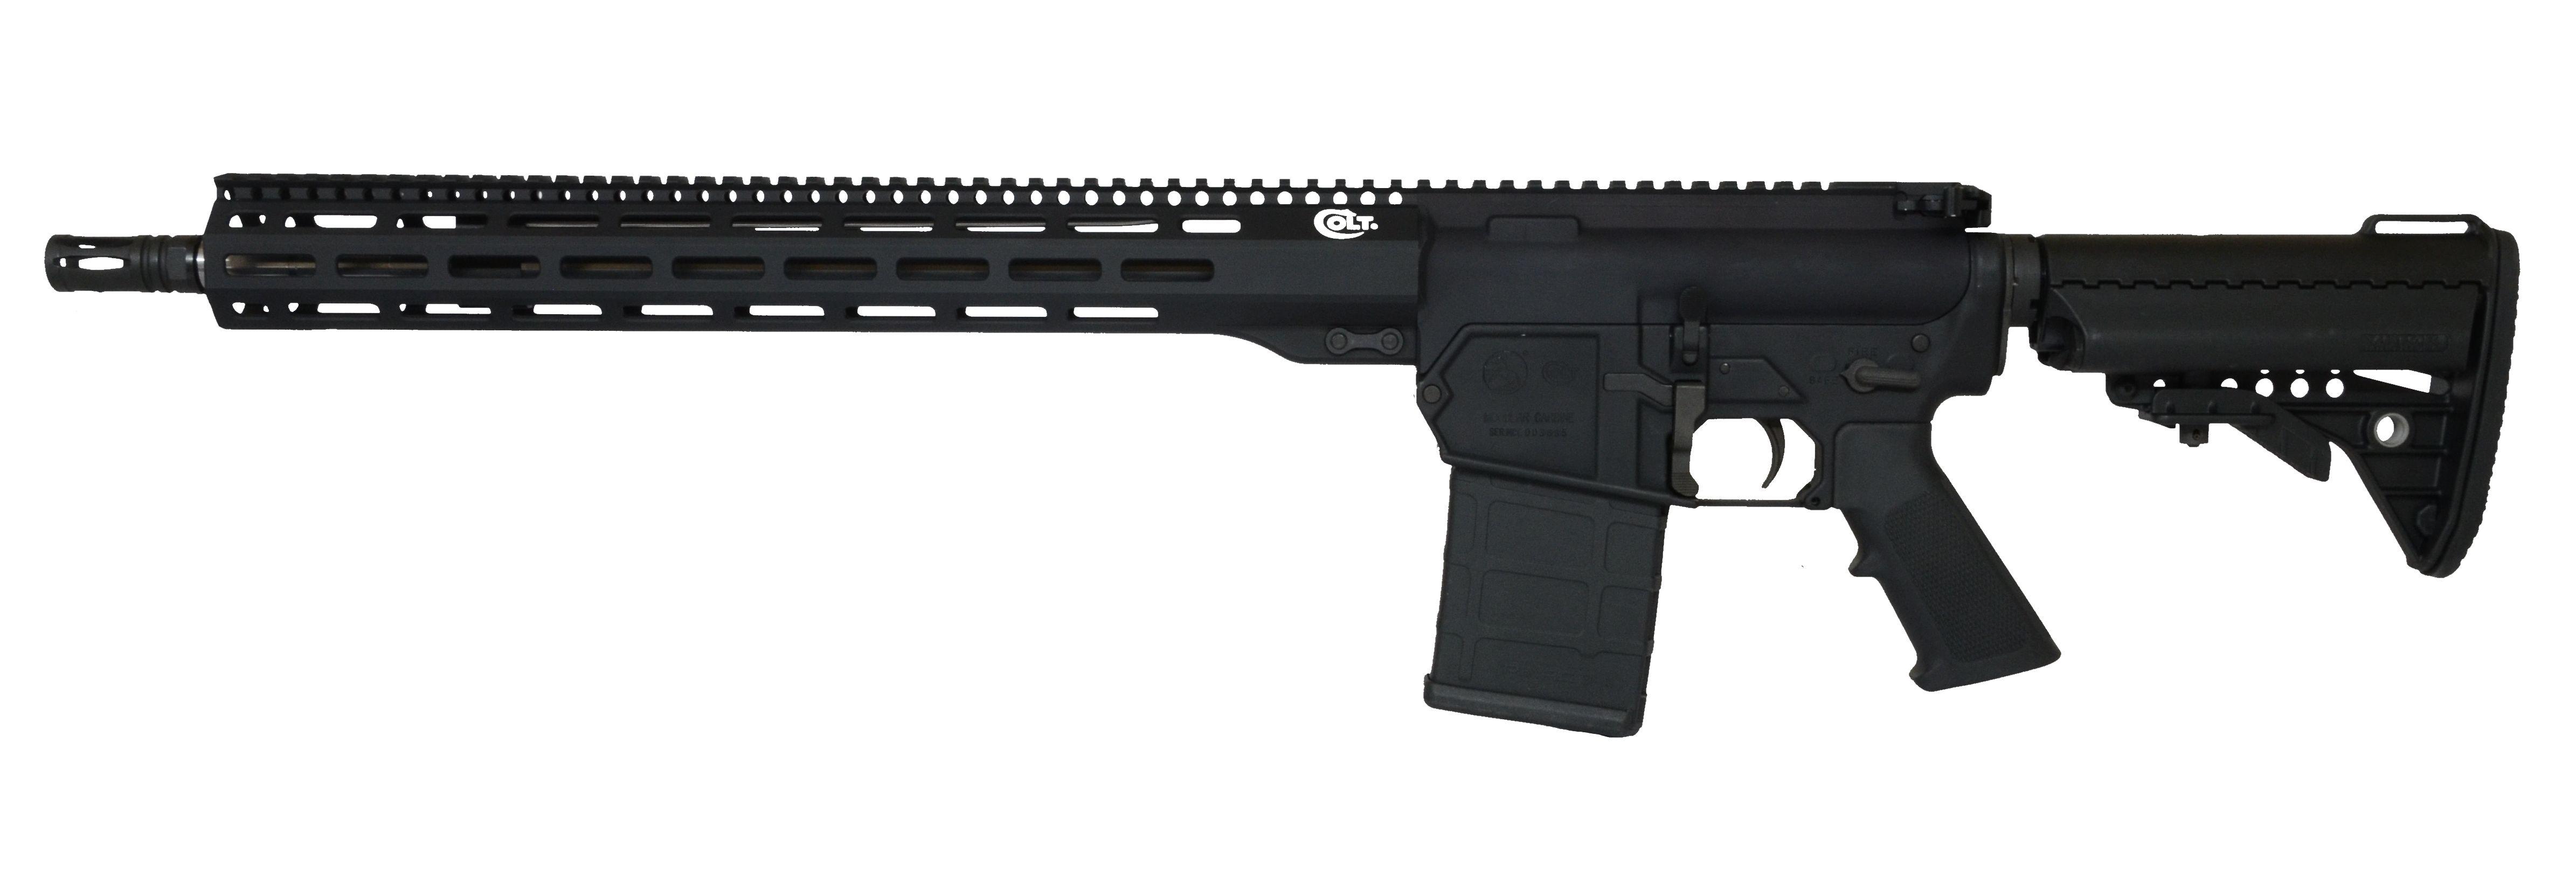 Colt CM762 6 5 Creedmoor Semi-Auto Rifle, 18″ Barrel, Matte Black Finish –  Colt CM65-18S - $1342 08 (Free S/H on Firearms)